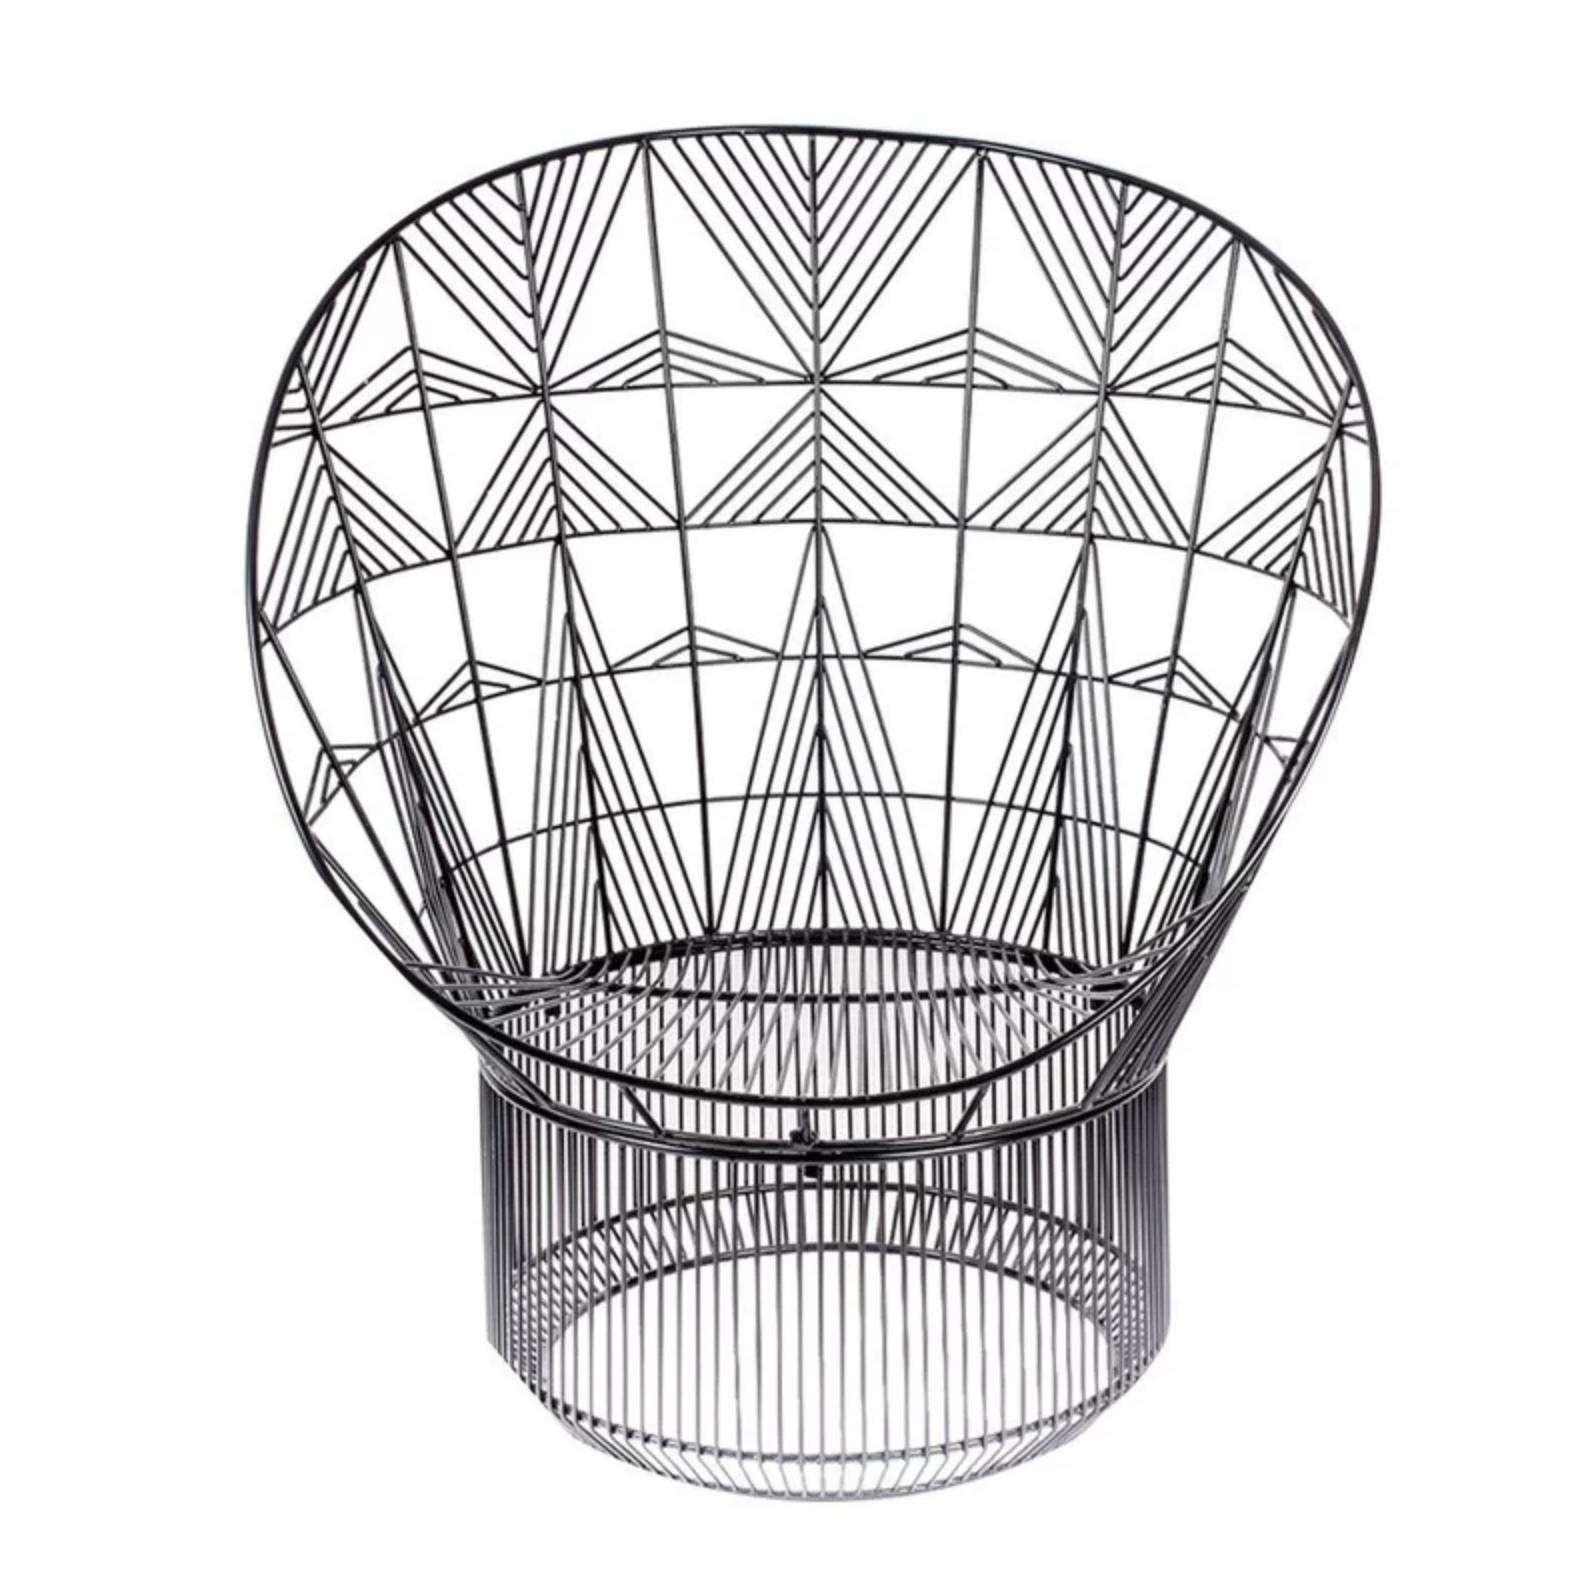 Black, Geometric Papasan Chair Accent Chair Roundup | Modern, Industrial, Rustic, Beach, Boho Accent and Arm Chairs | Miranda Schroeder Blog